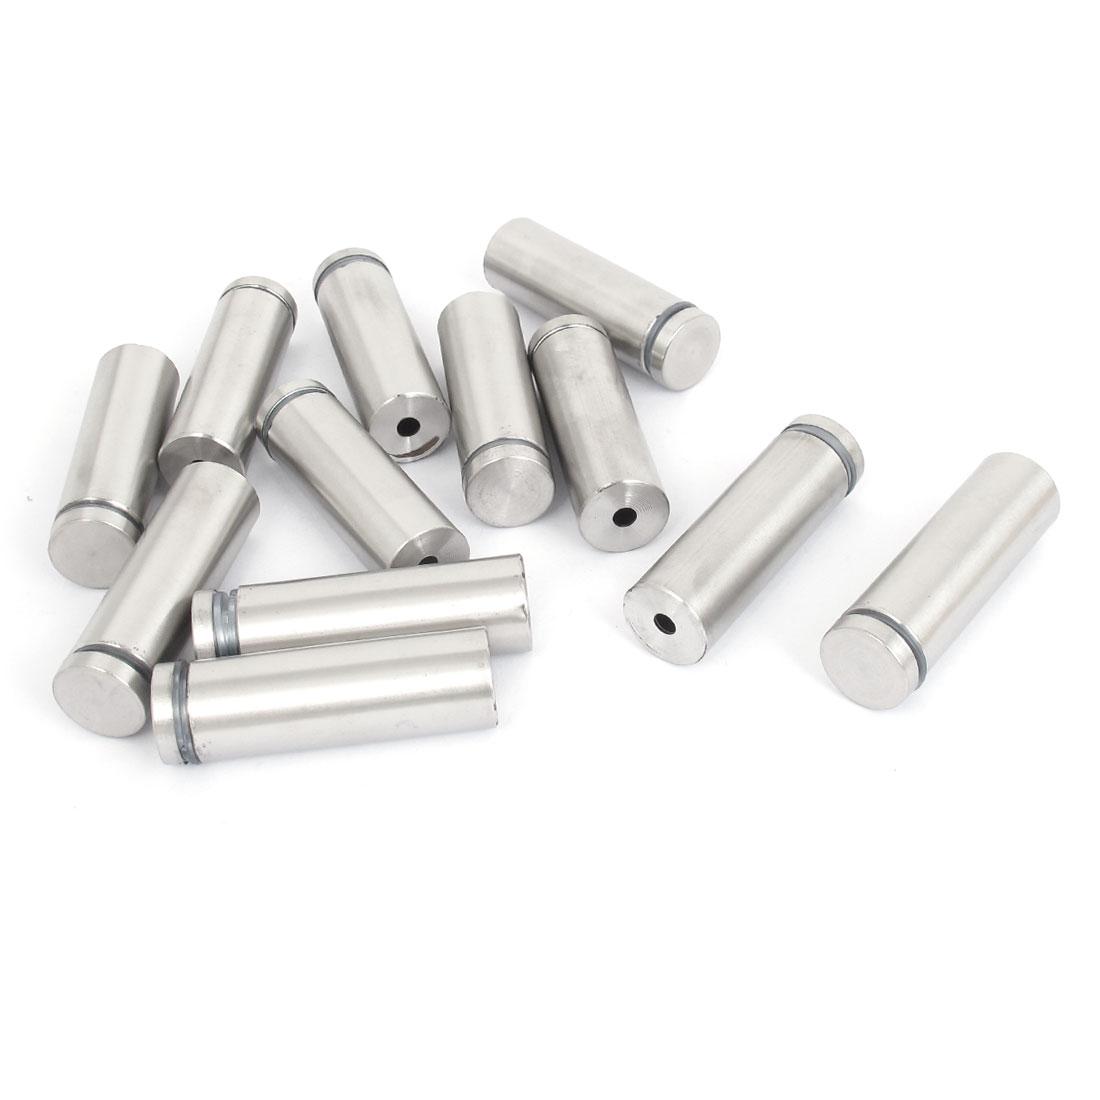 19mm x 60mm Stainless Steel Advertising Frameless Glass Standoff Pins 12pcs